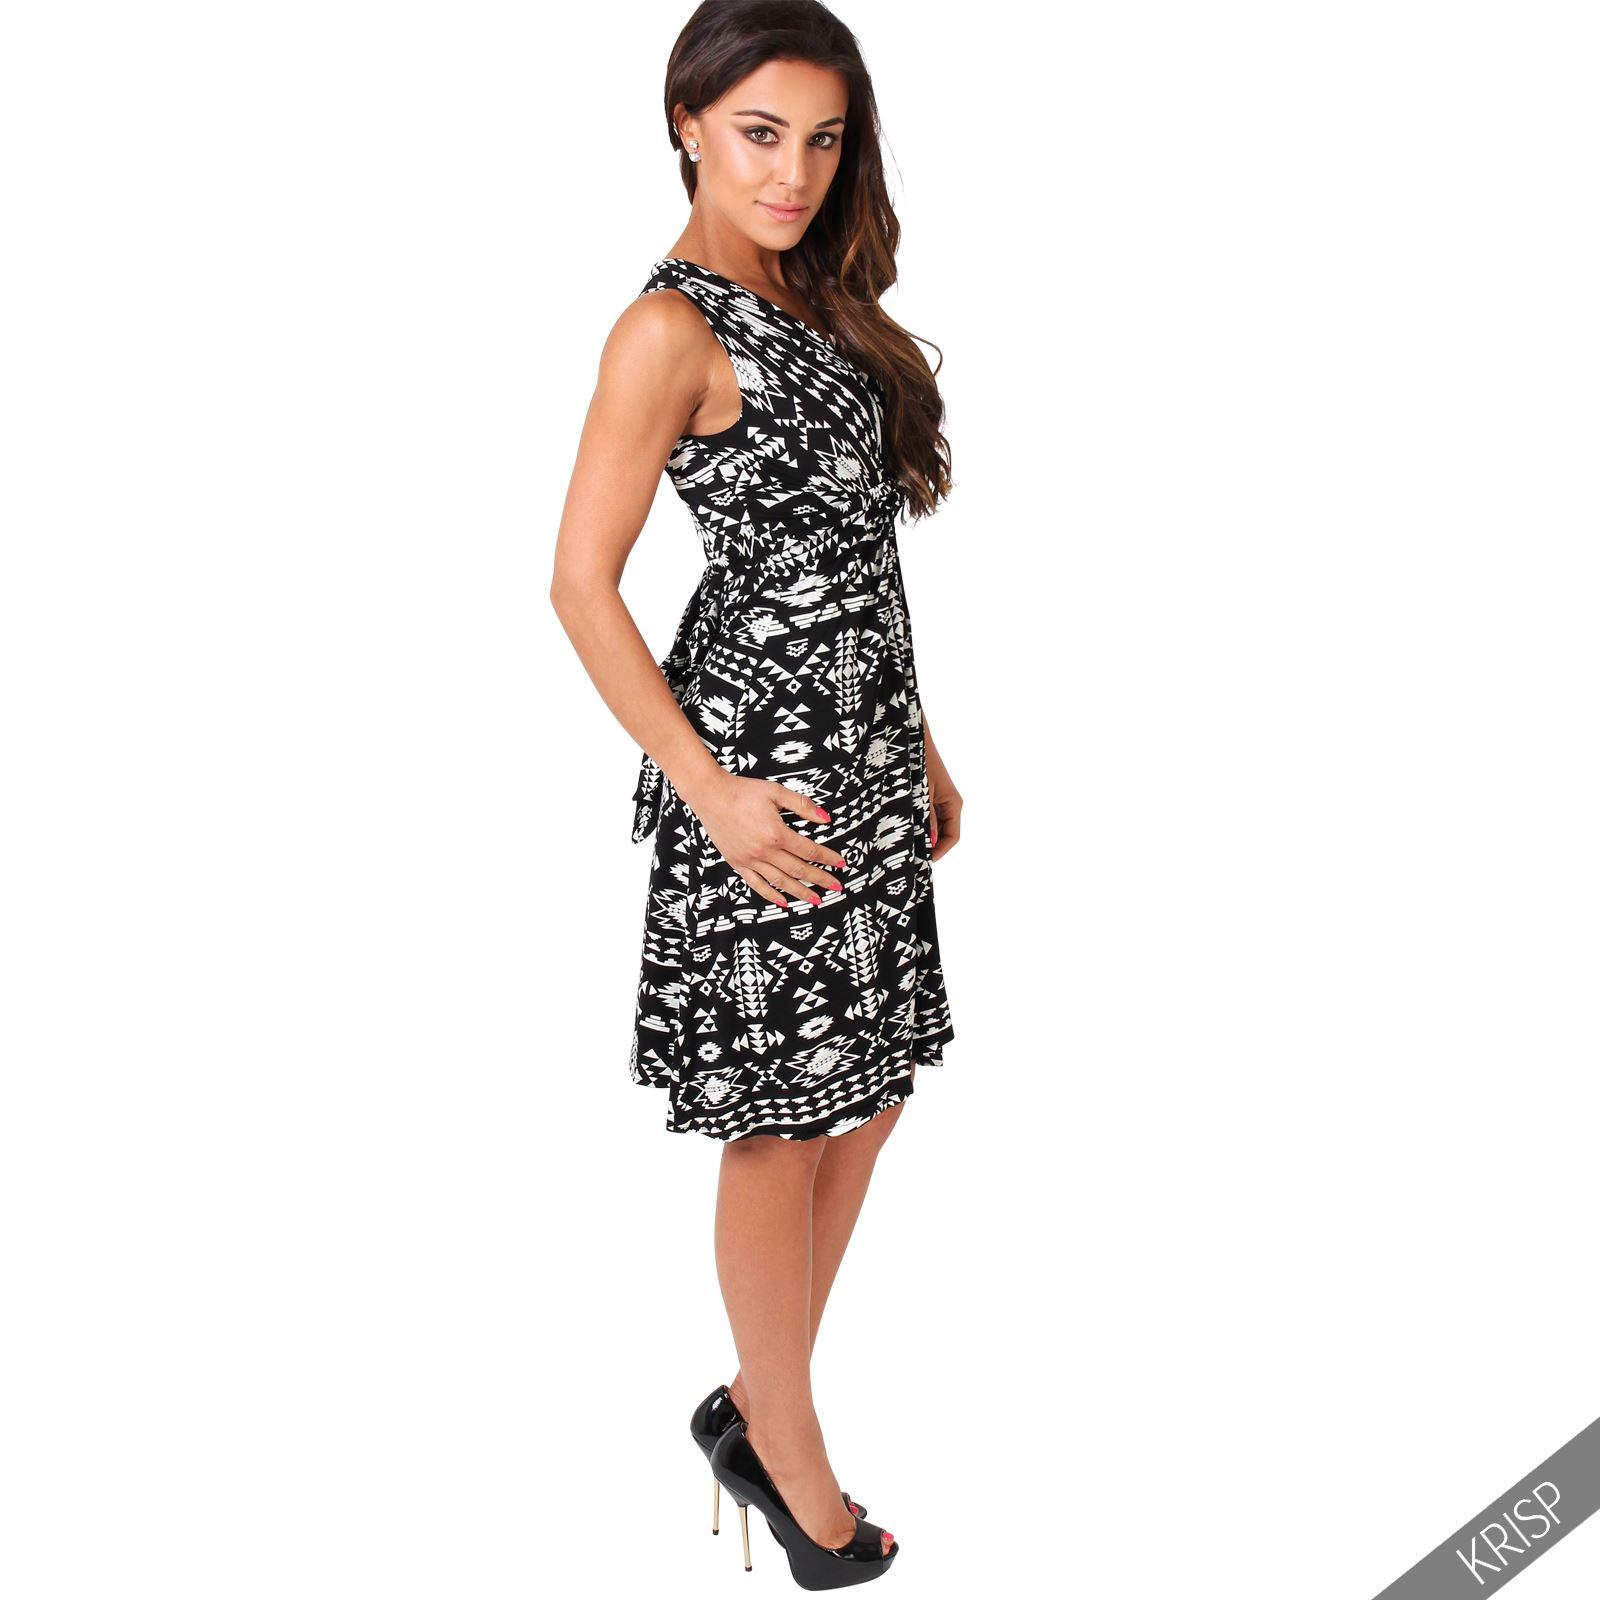 Womens-V-Neck-Mini-Dress-Small-Sizes-Short-Skirt-Tribal-Print-Front-Knot-Party thumbnail 7